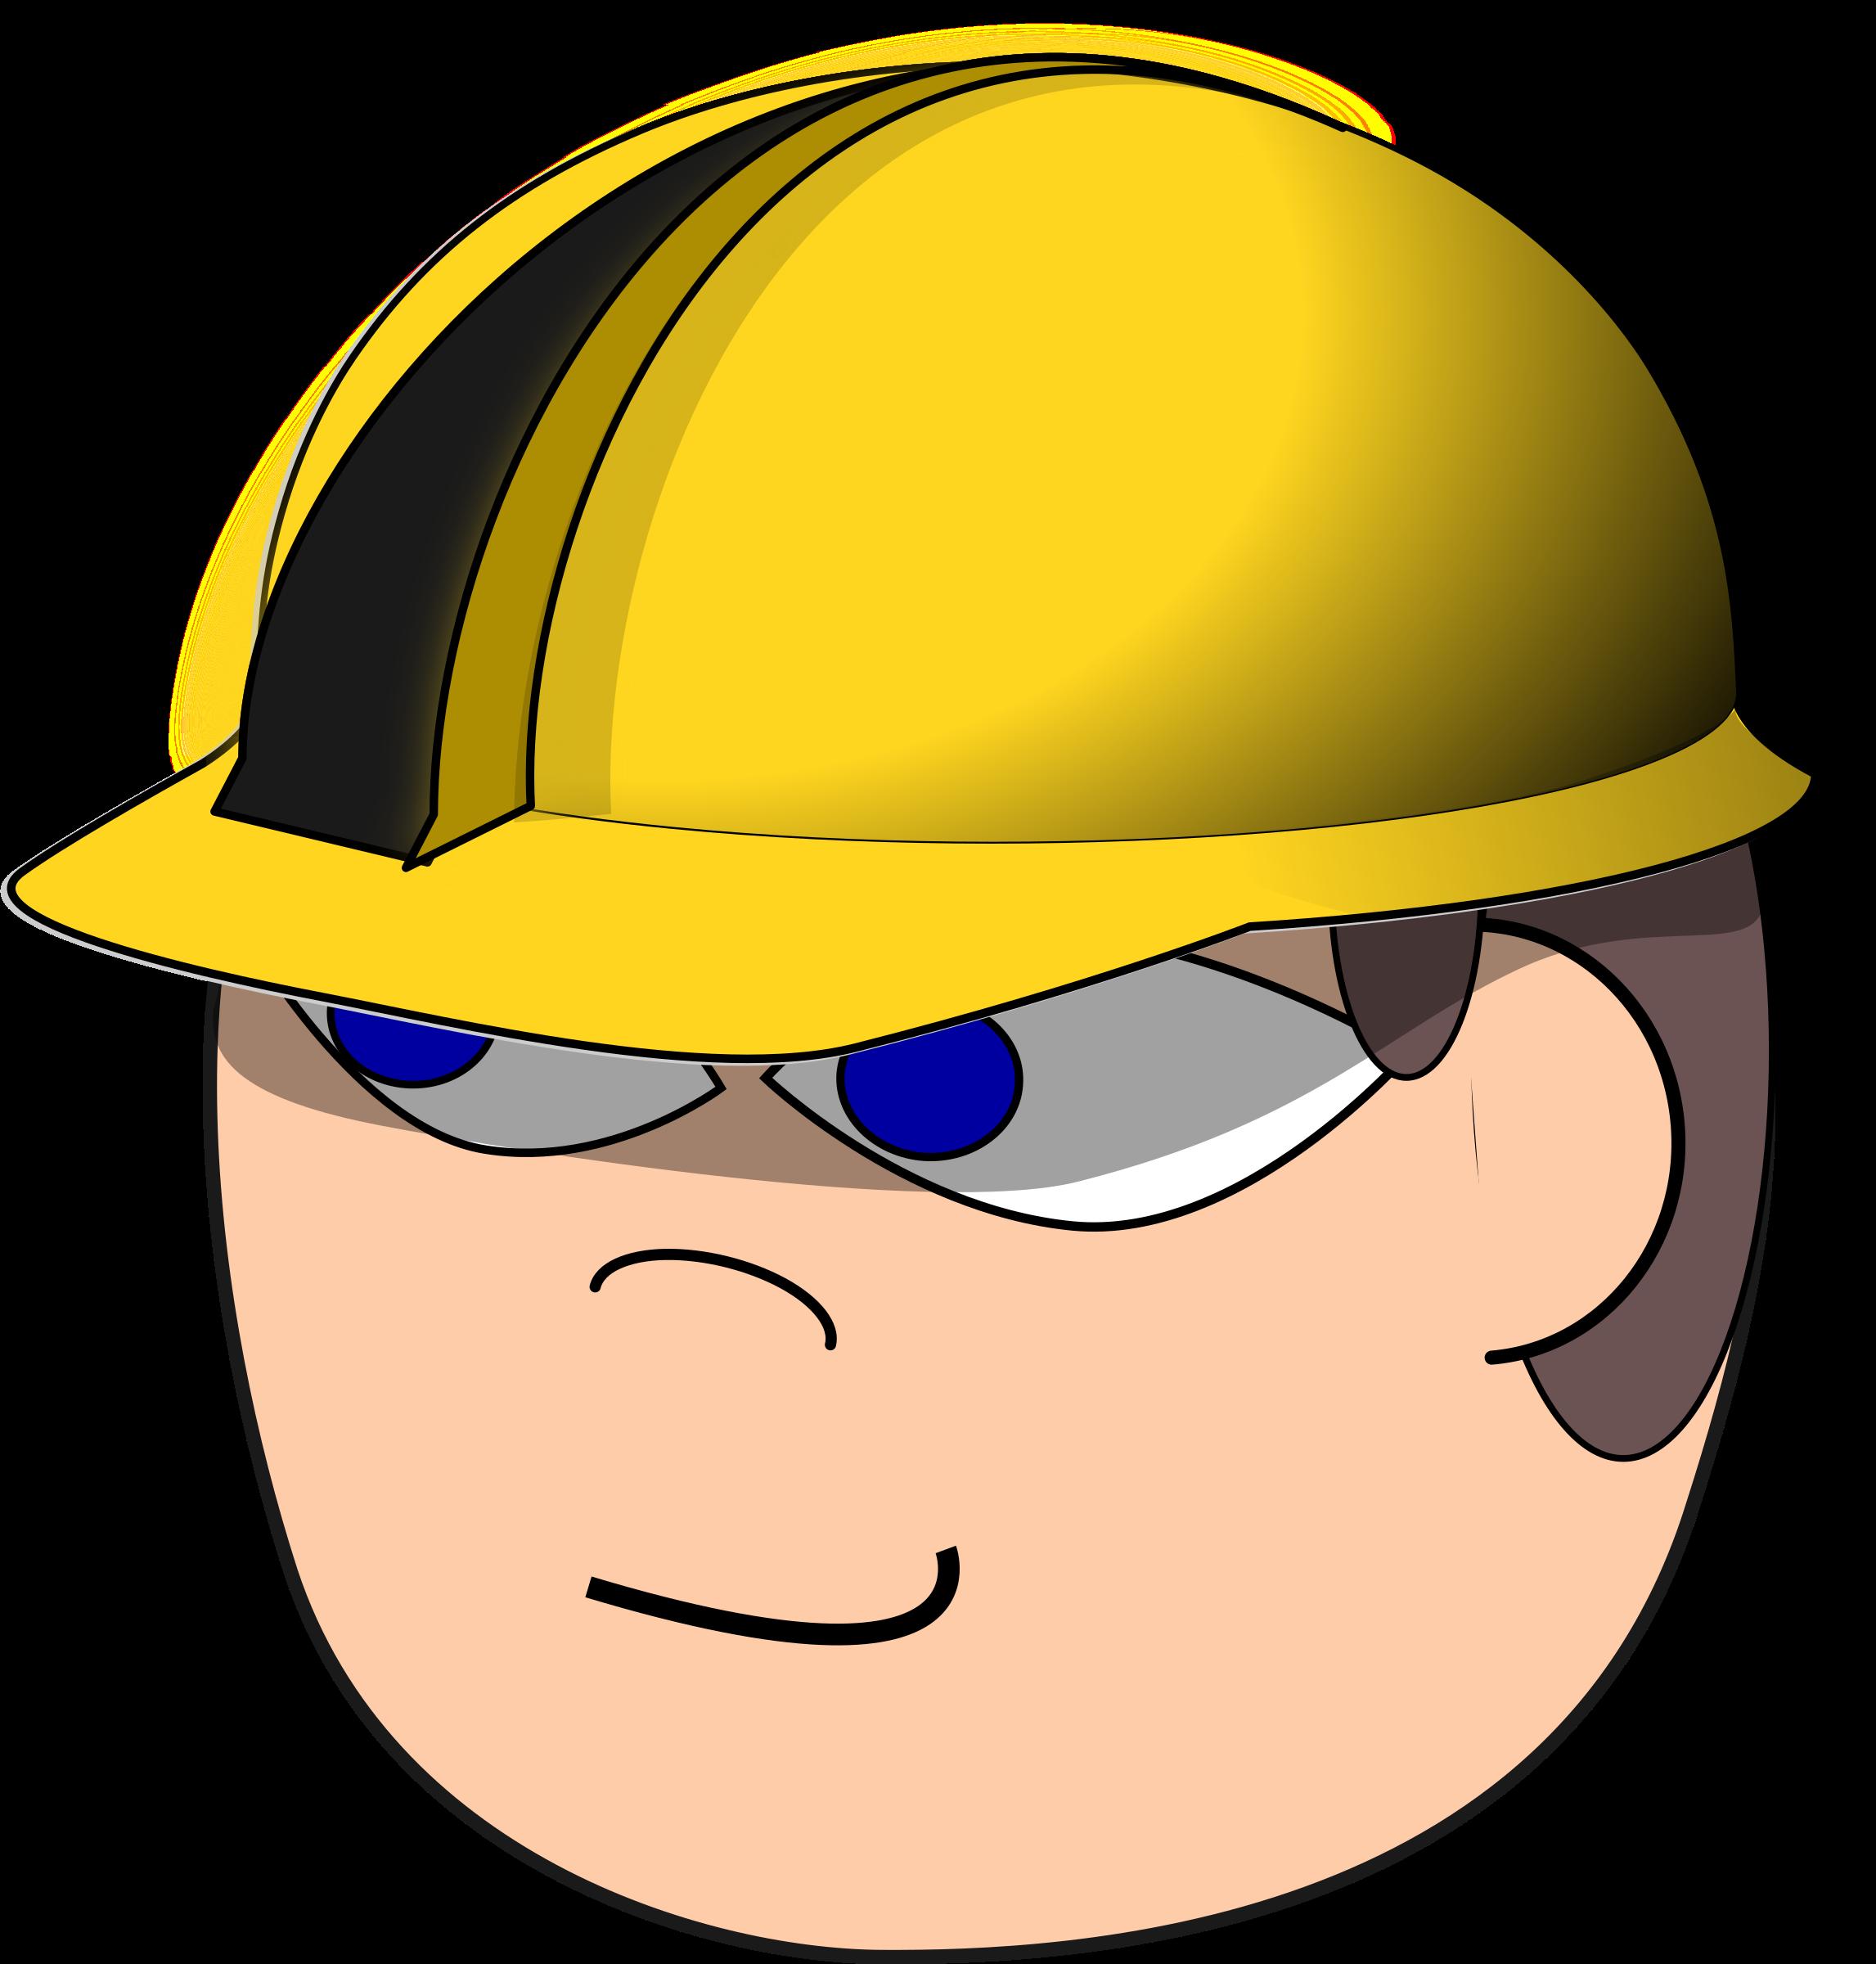 Helmet clipart construction worker. Big image png